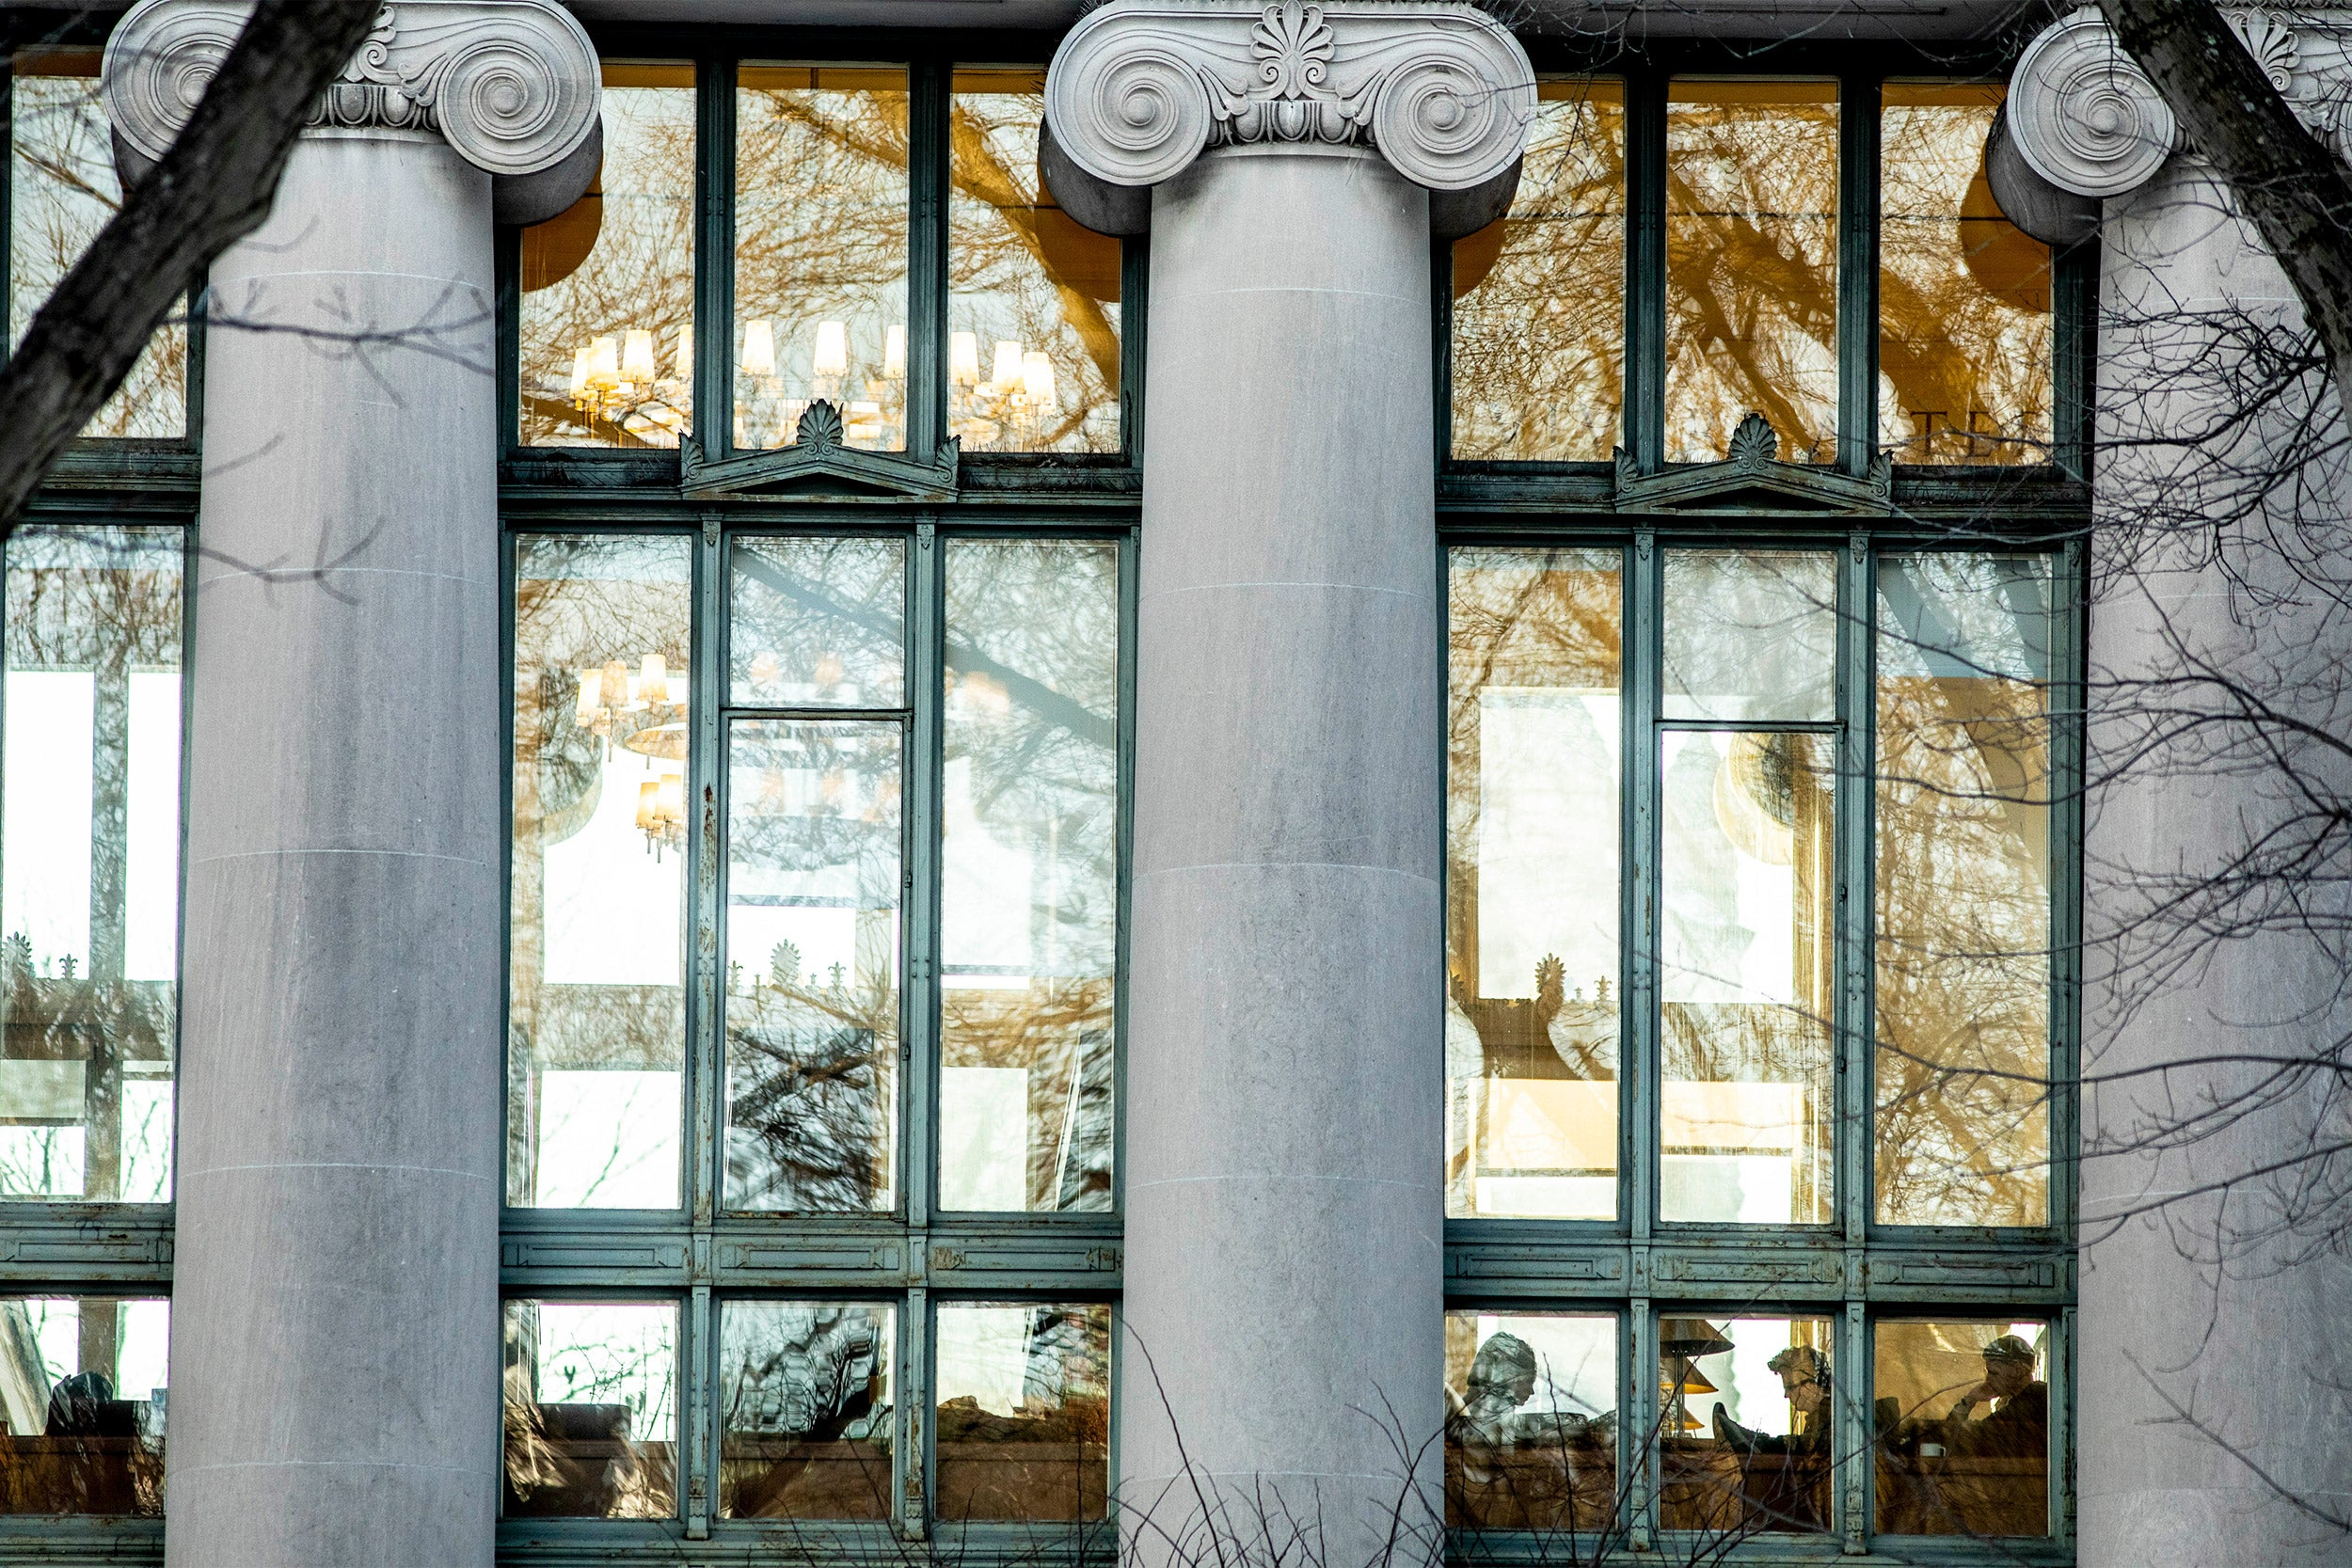 View of Langdell Library at Harvard University.